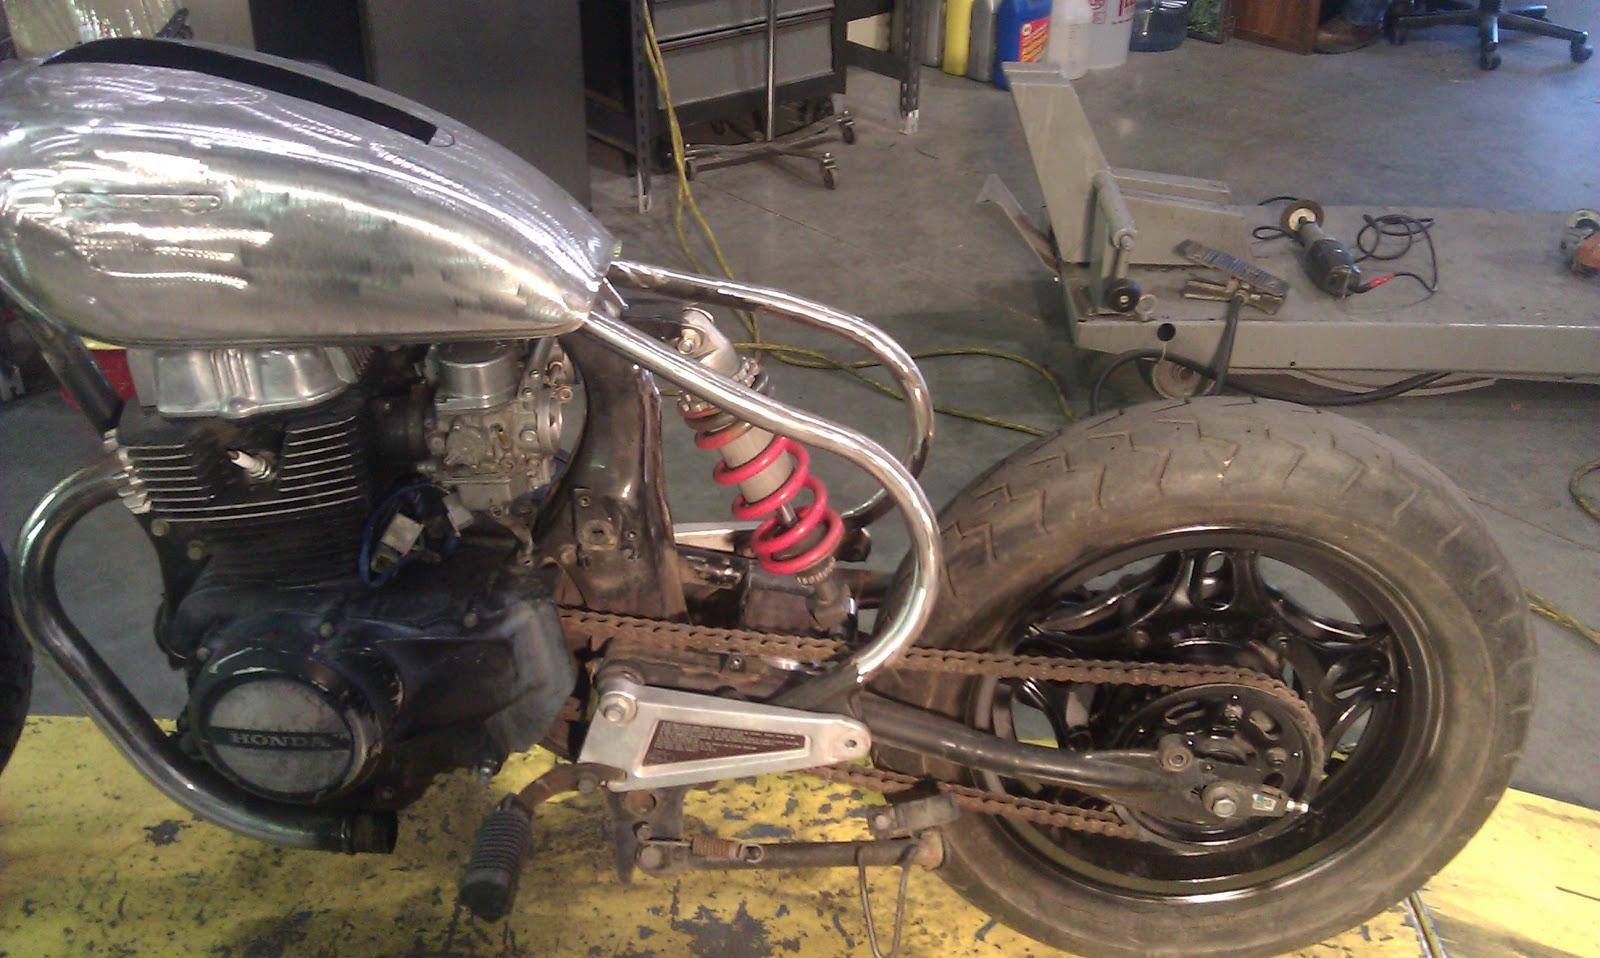 JMR Customs CB450 Honda Nighthawk